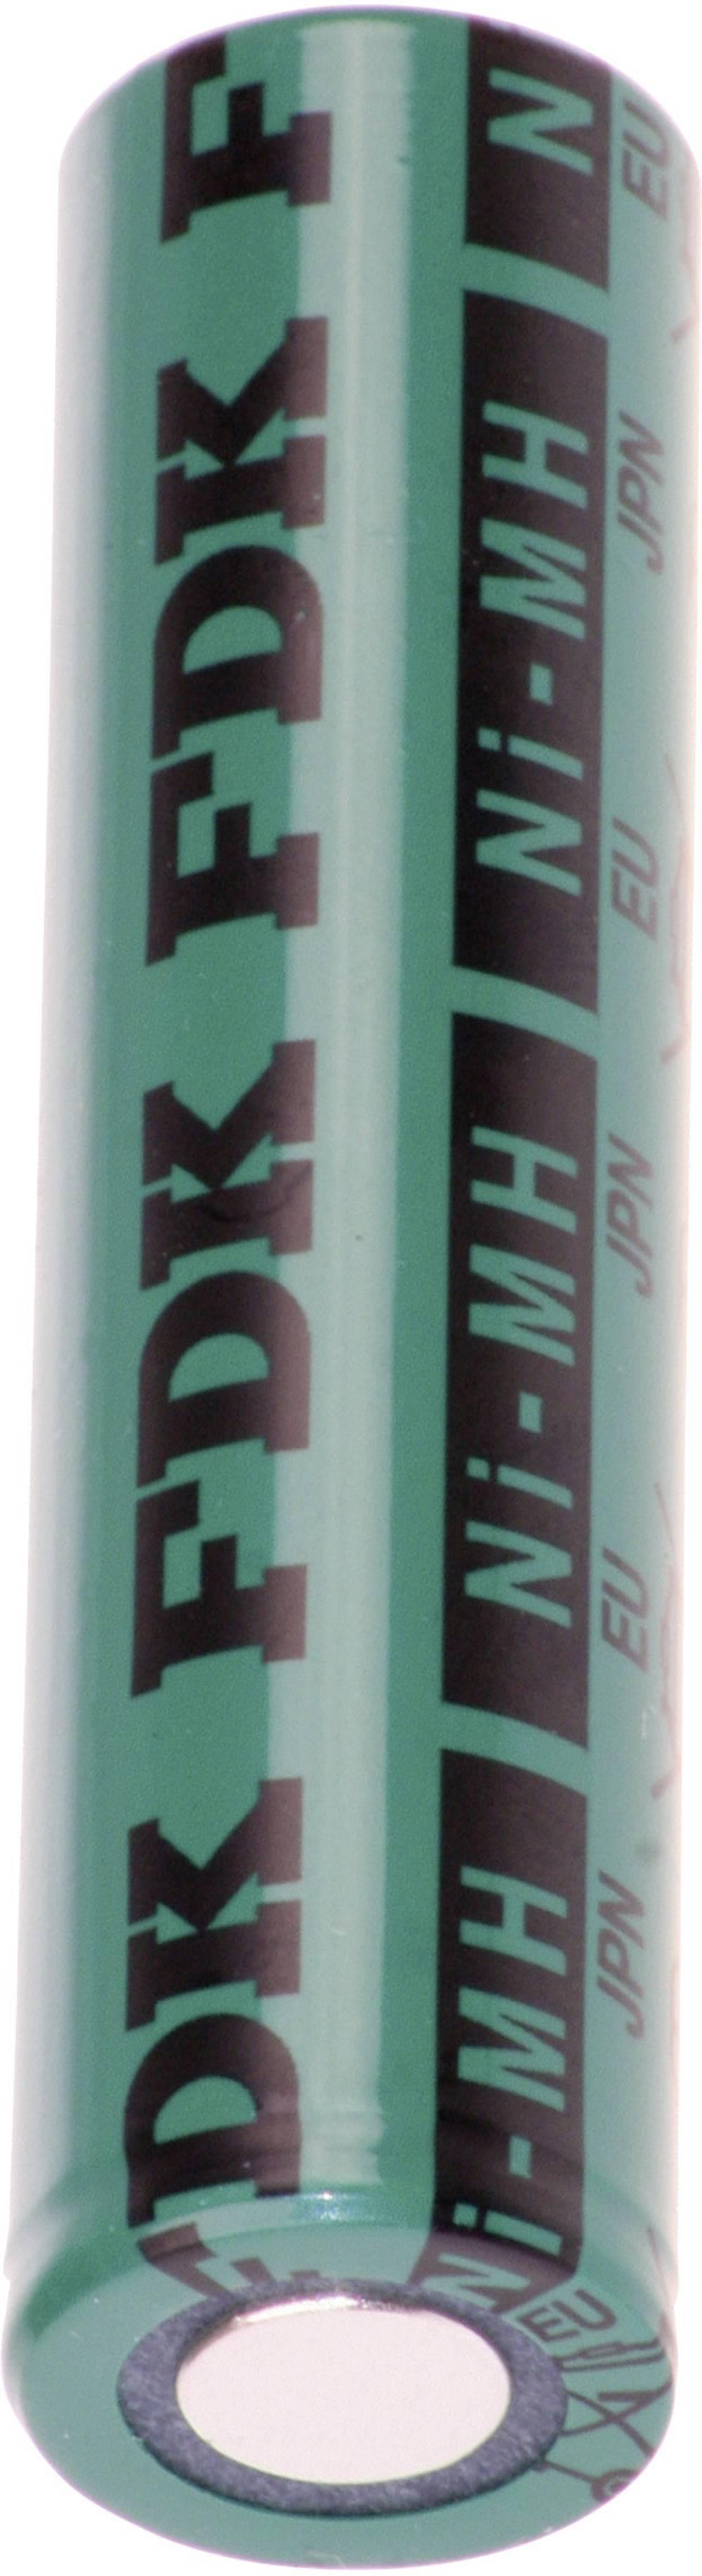 NiMH akumulator FDK 4/3 A HR-4/3AU 1.2 V 4000 mAh (Ø x V) 17 mm x 67.5 mm